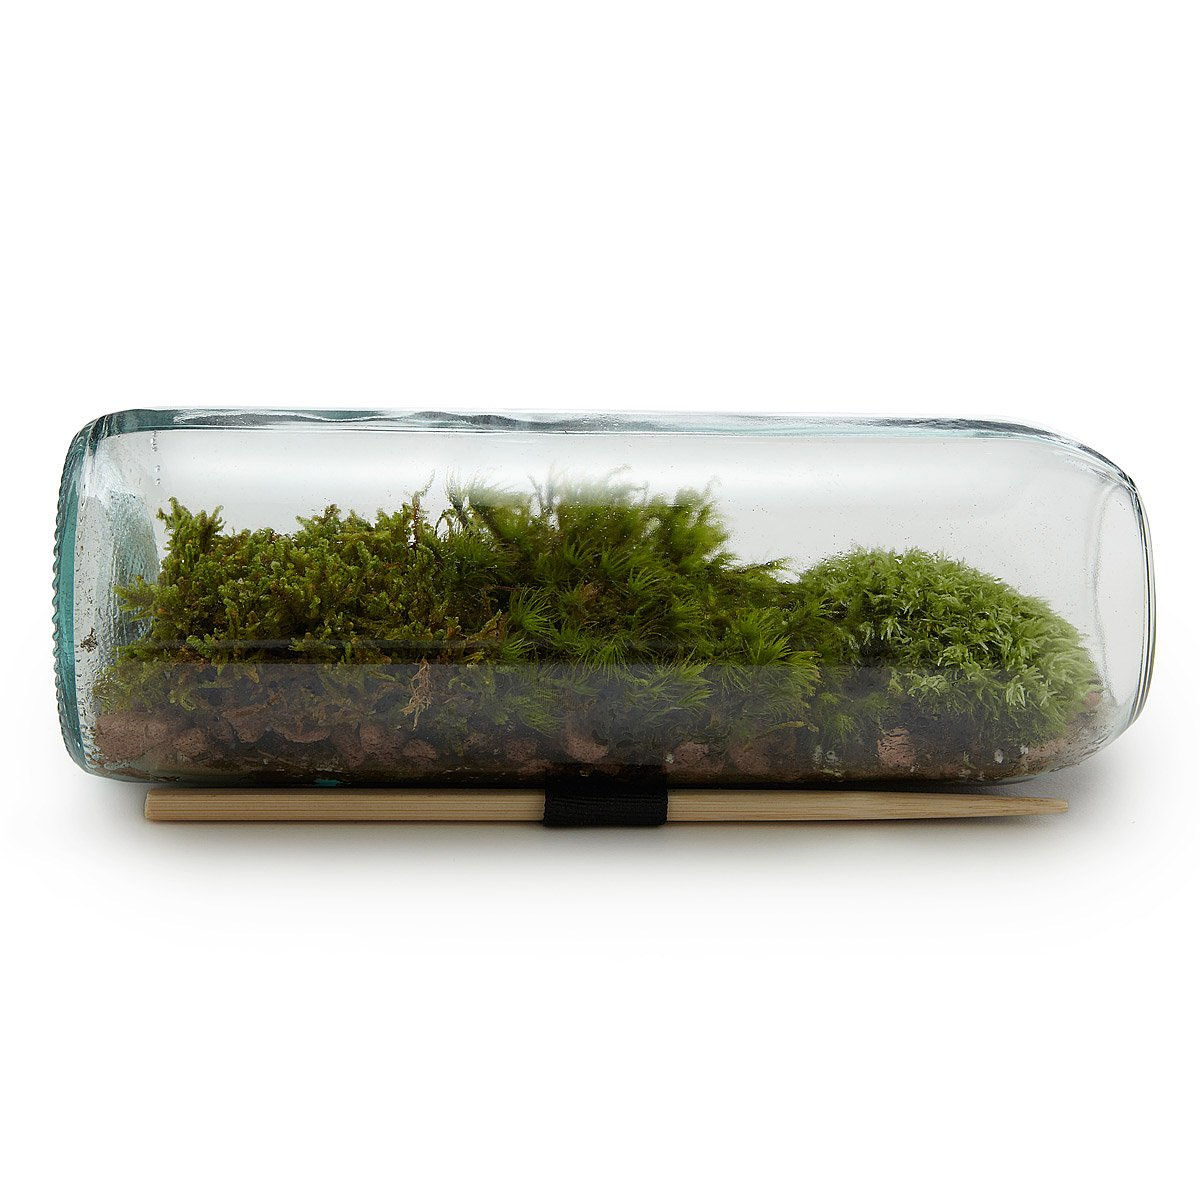 Moss Terrarium Bottle Glass Terrarium Gift Uncommon Goods